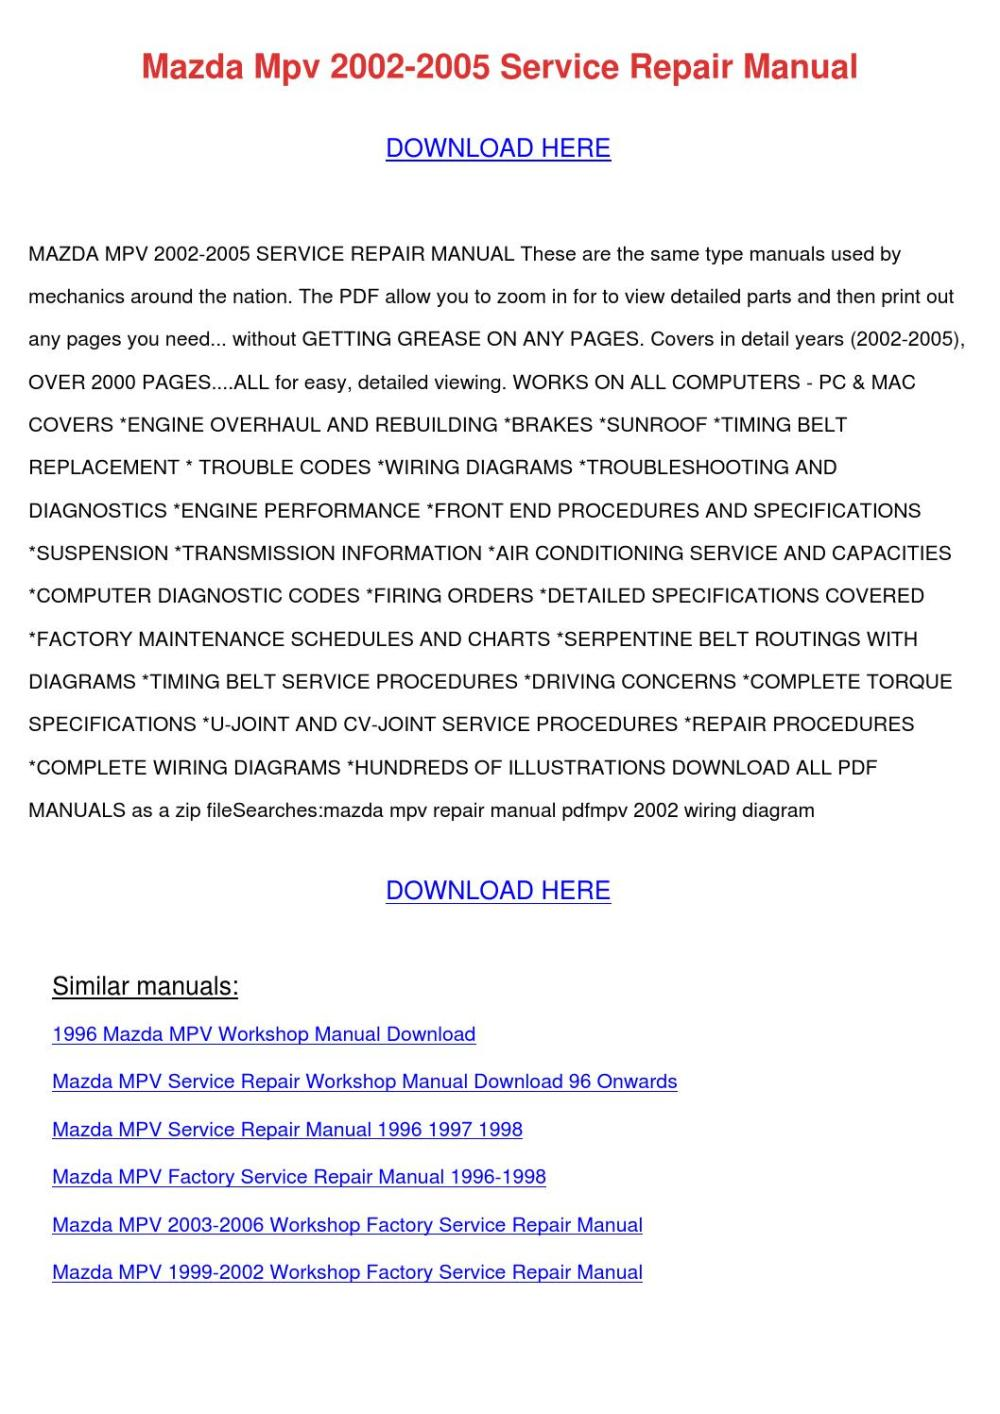 medium resolution of mazda mpv 2002 2005 service repair manual by sanorarowland issuu